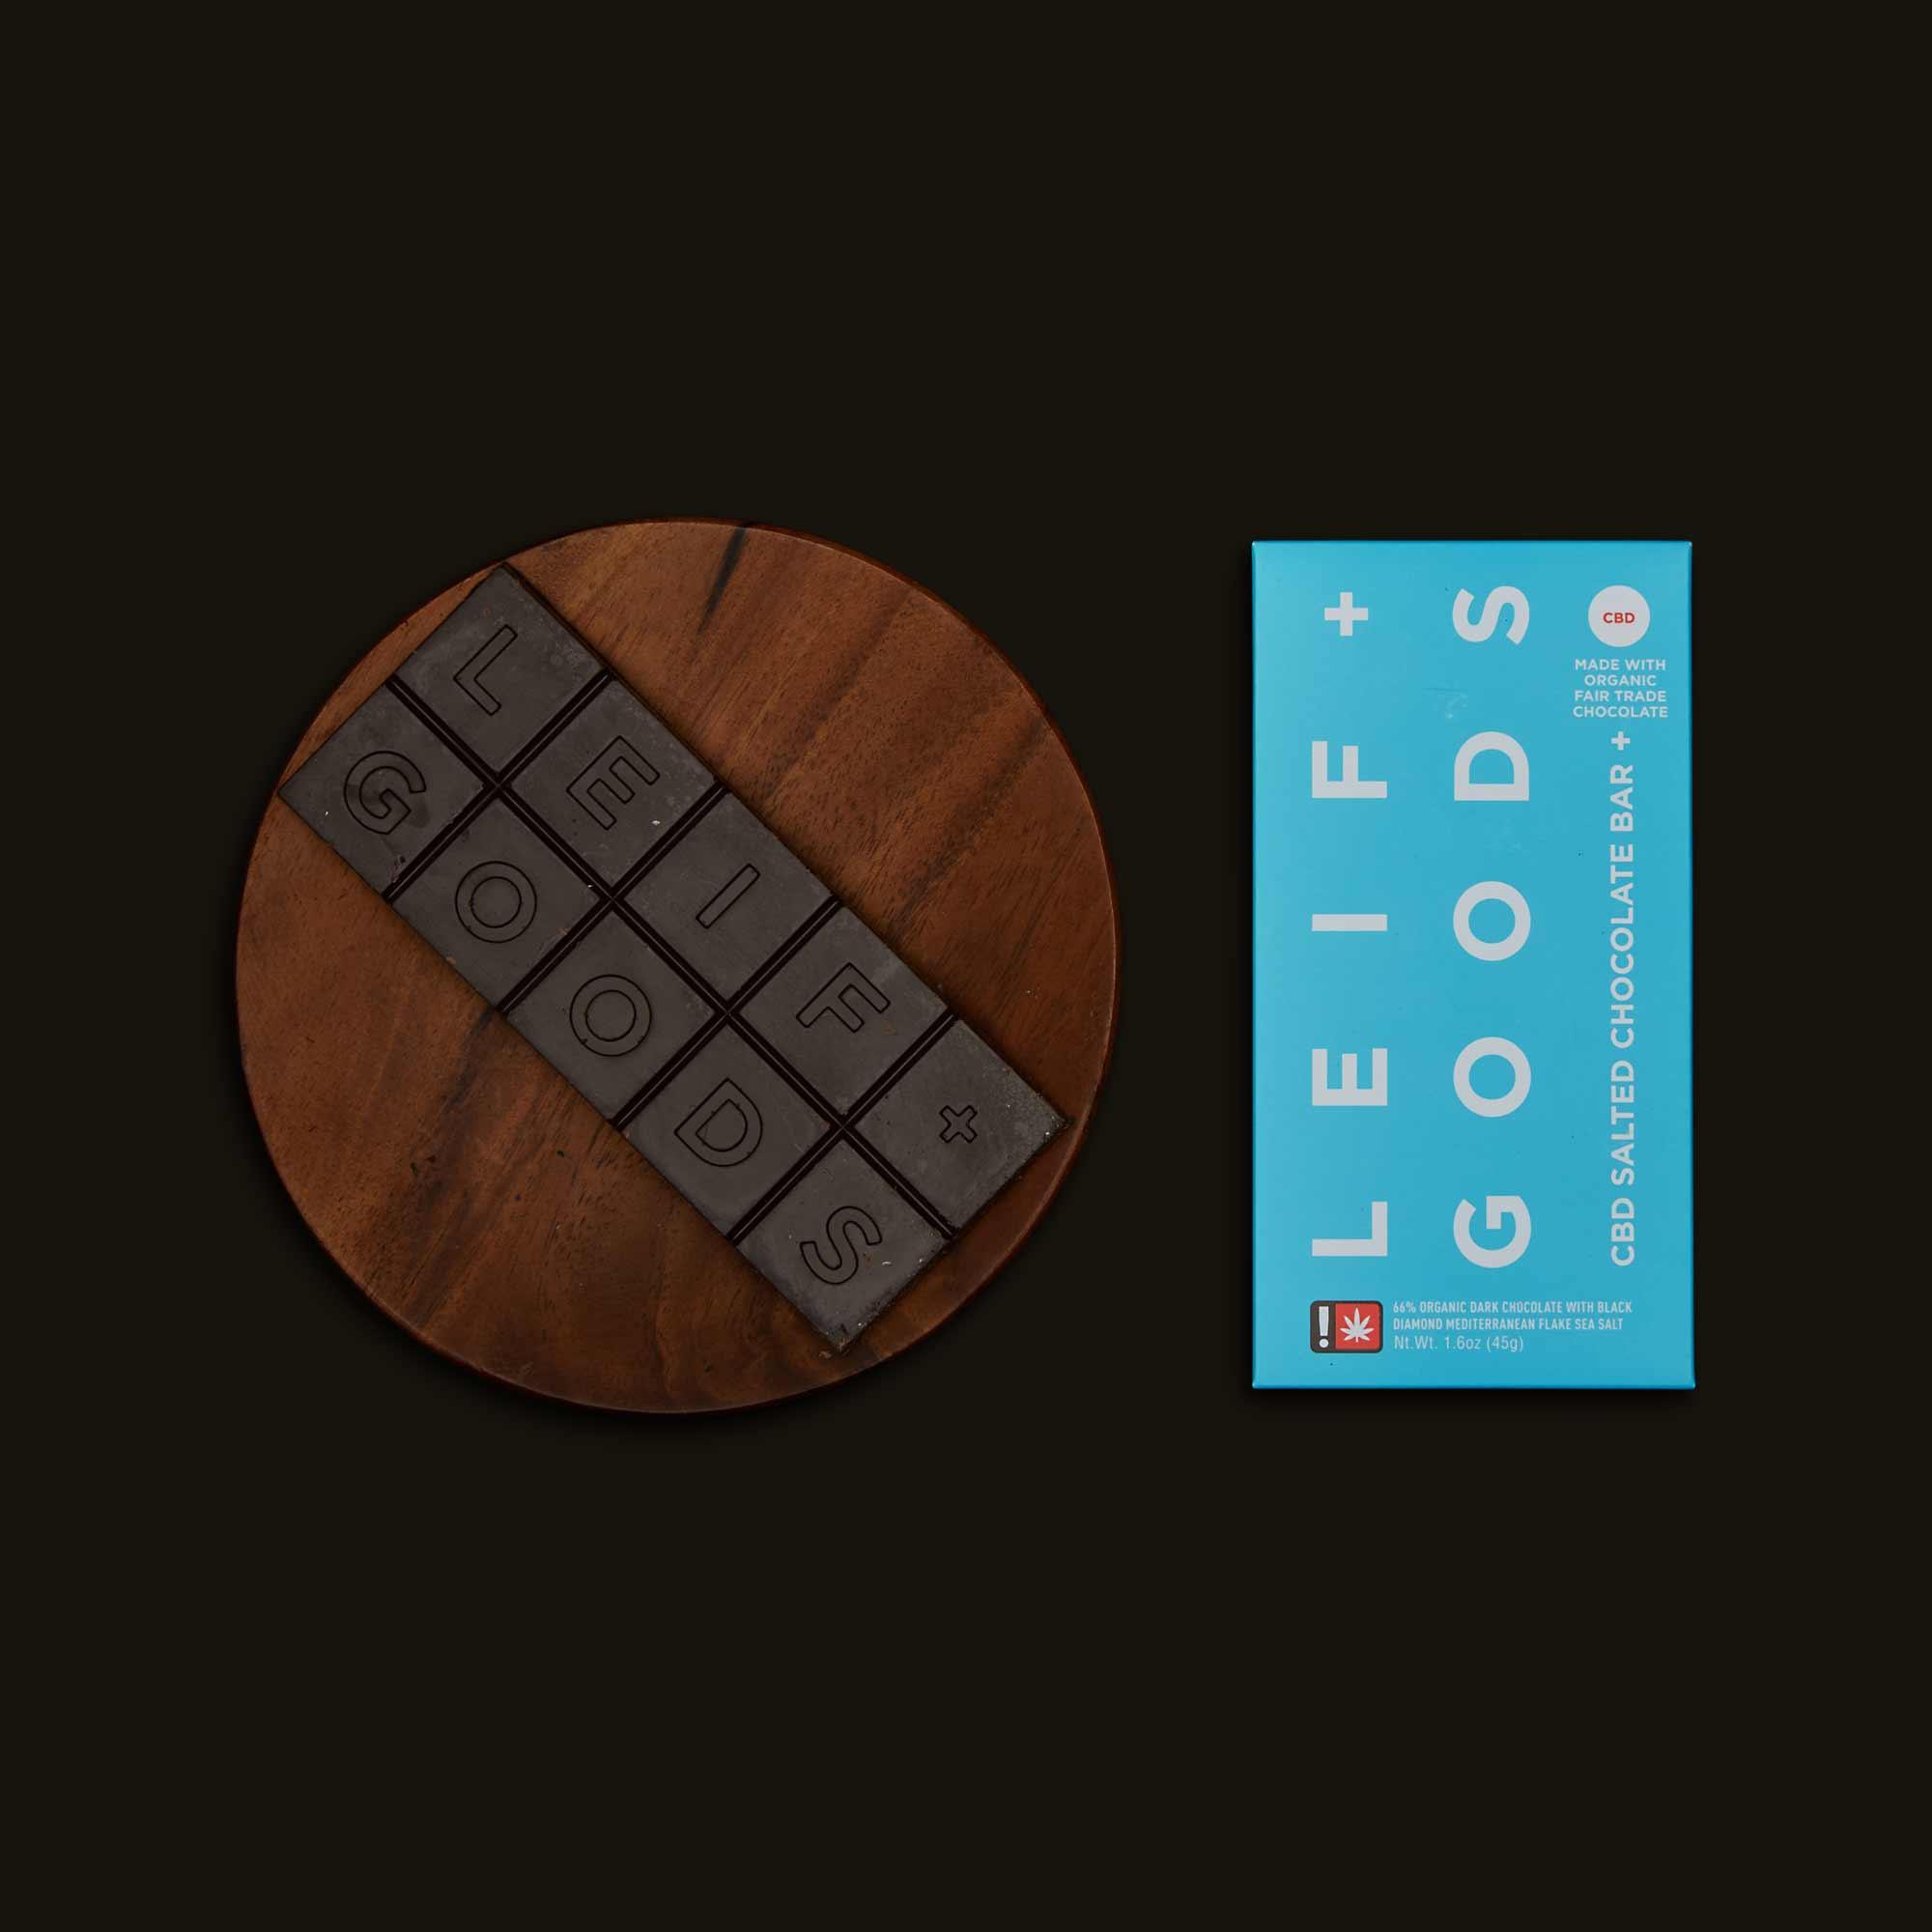 Leif Goods CBD Salted Chocolate Bar